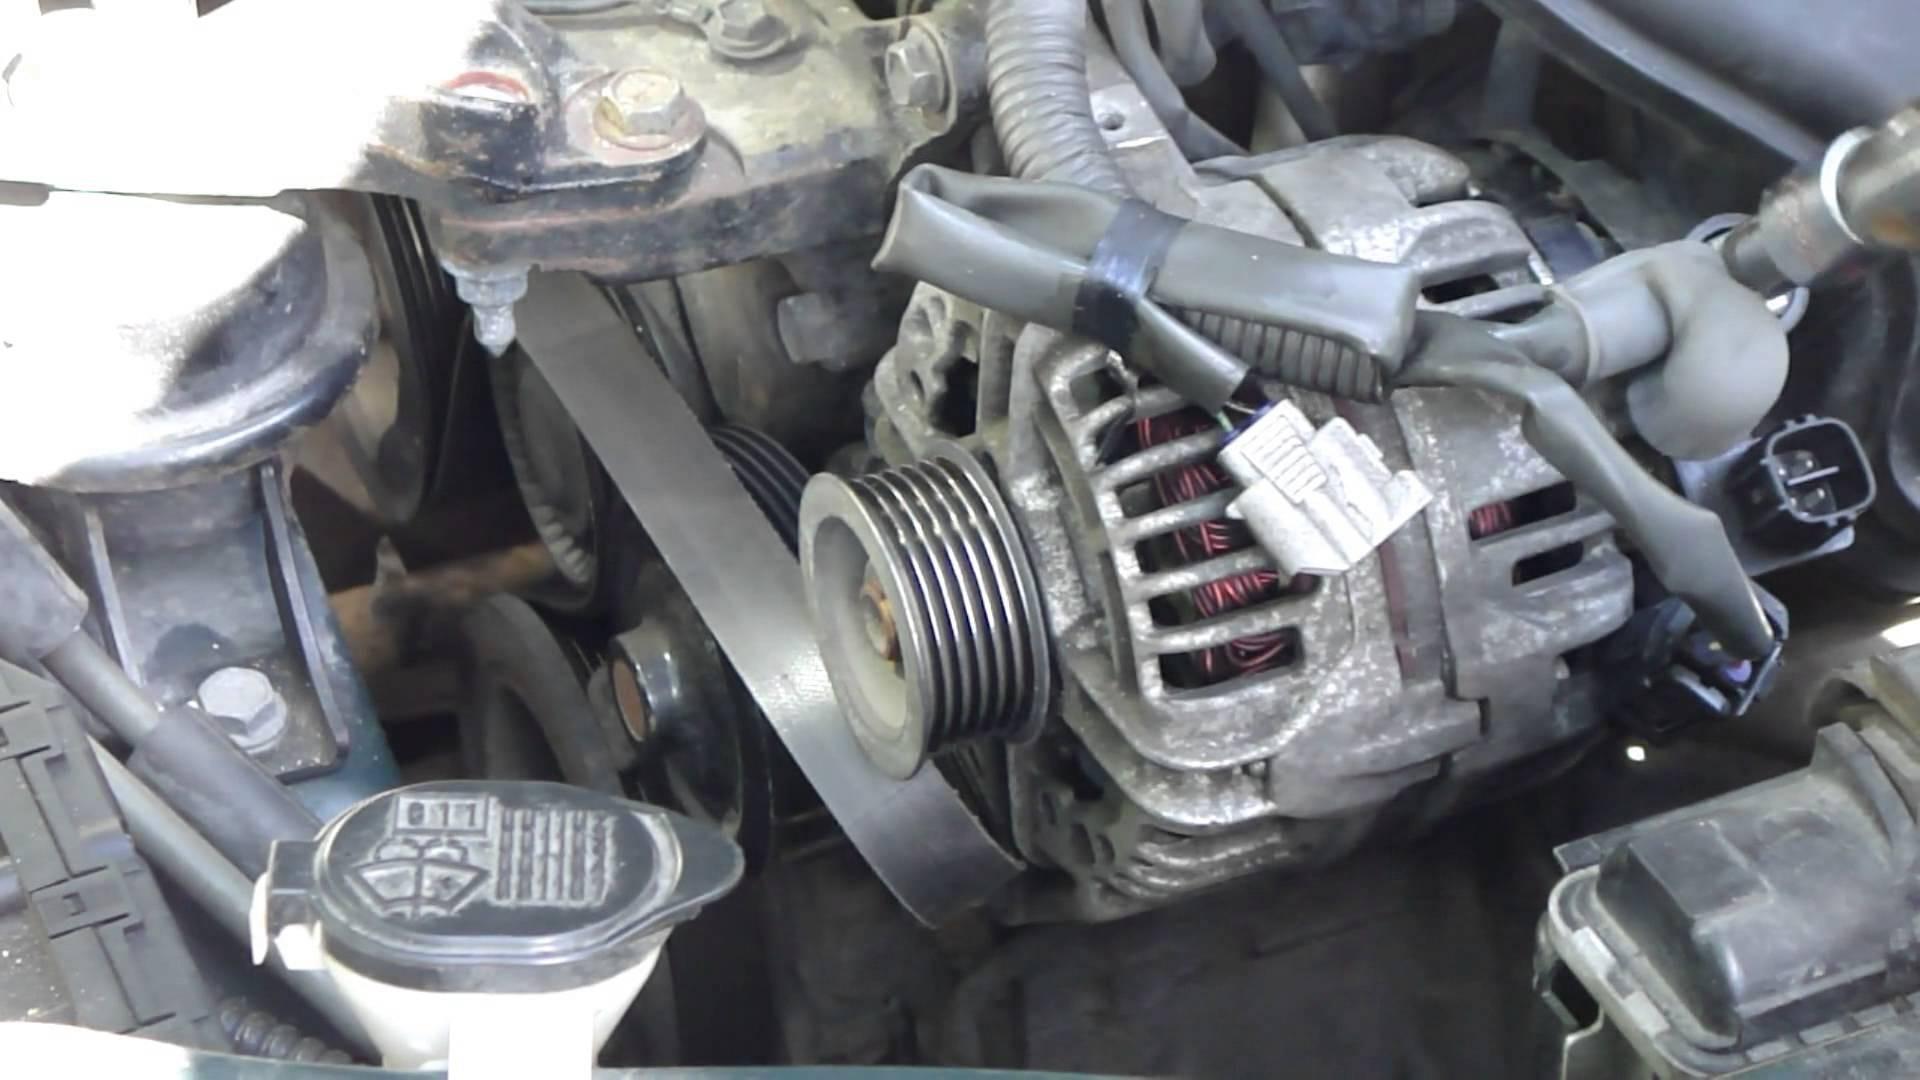 1997 toyota Corolla Engine Diagram How to Change Alternator toyota Corolla Vvt I Engine Years 2000 Of 1997 toyota Corolla Engine Diagram